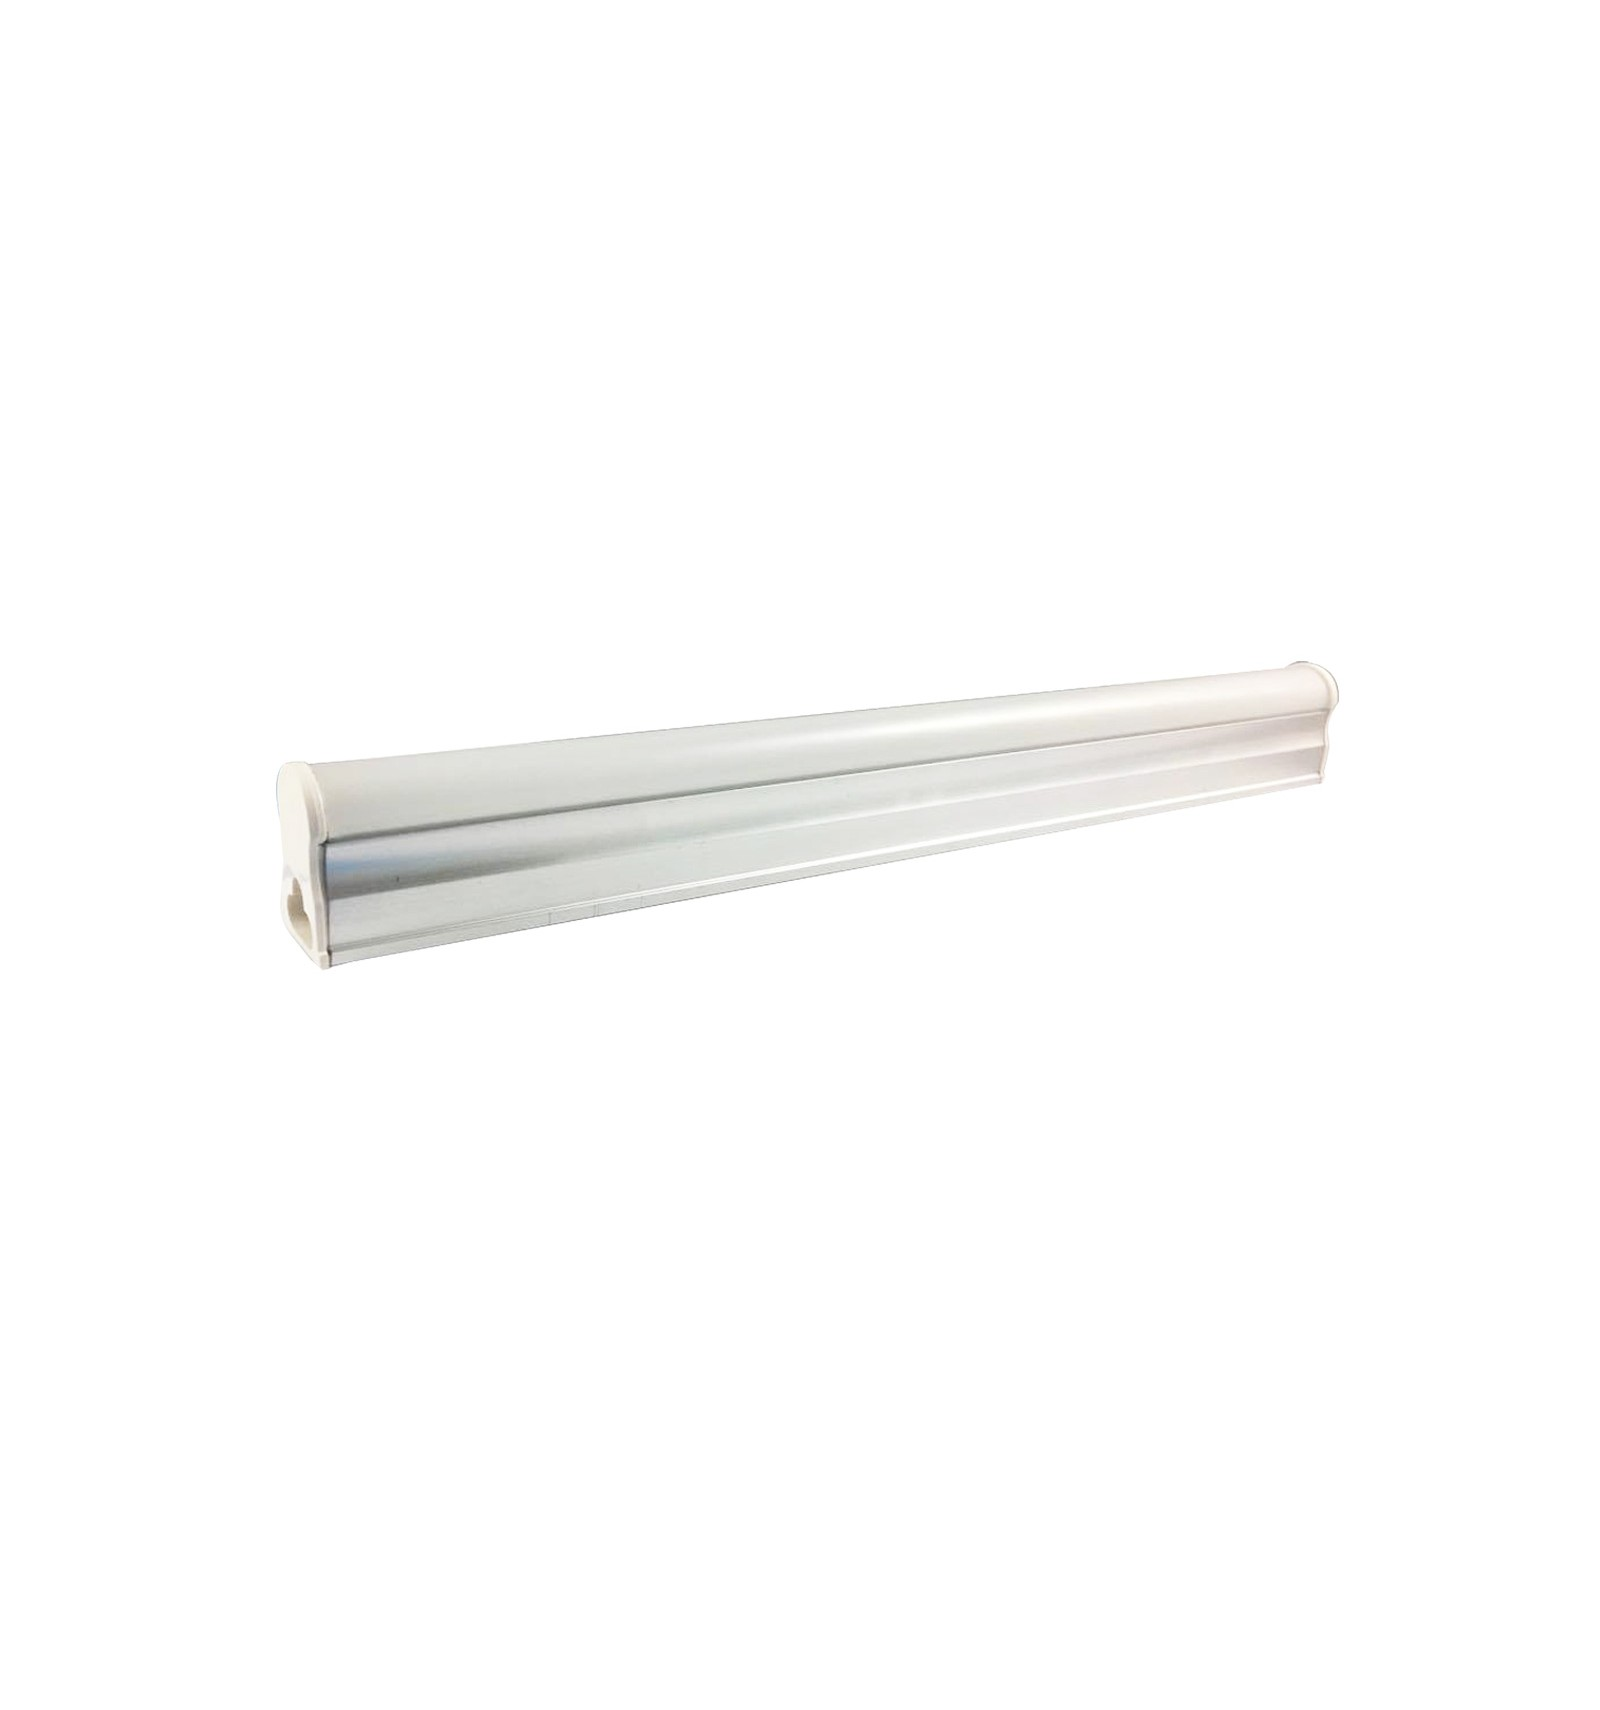 tube led t5 20w blanc neutre 4500k longueur 150cm. Black Bedroom Furniture Sets. Home Design Ideas